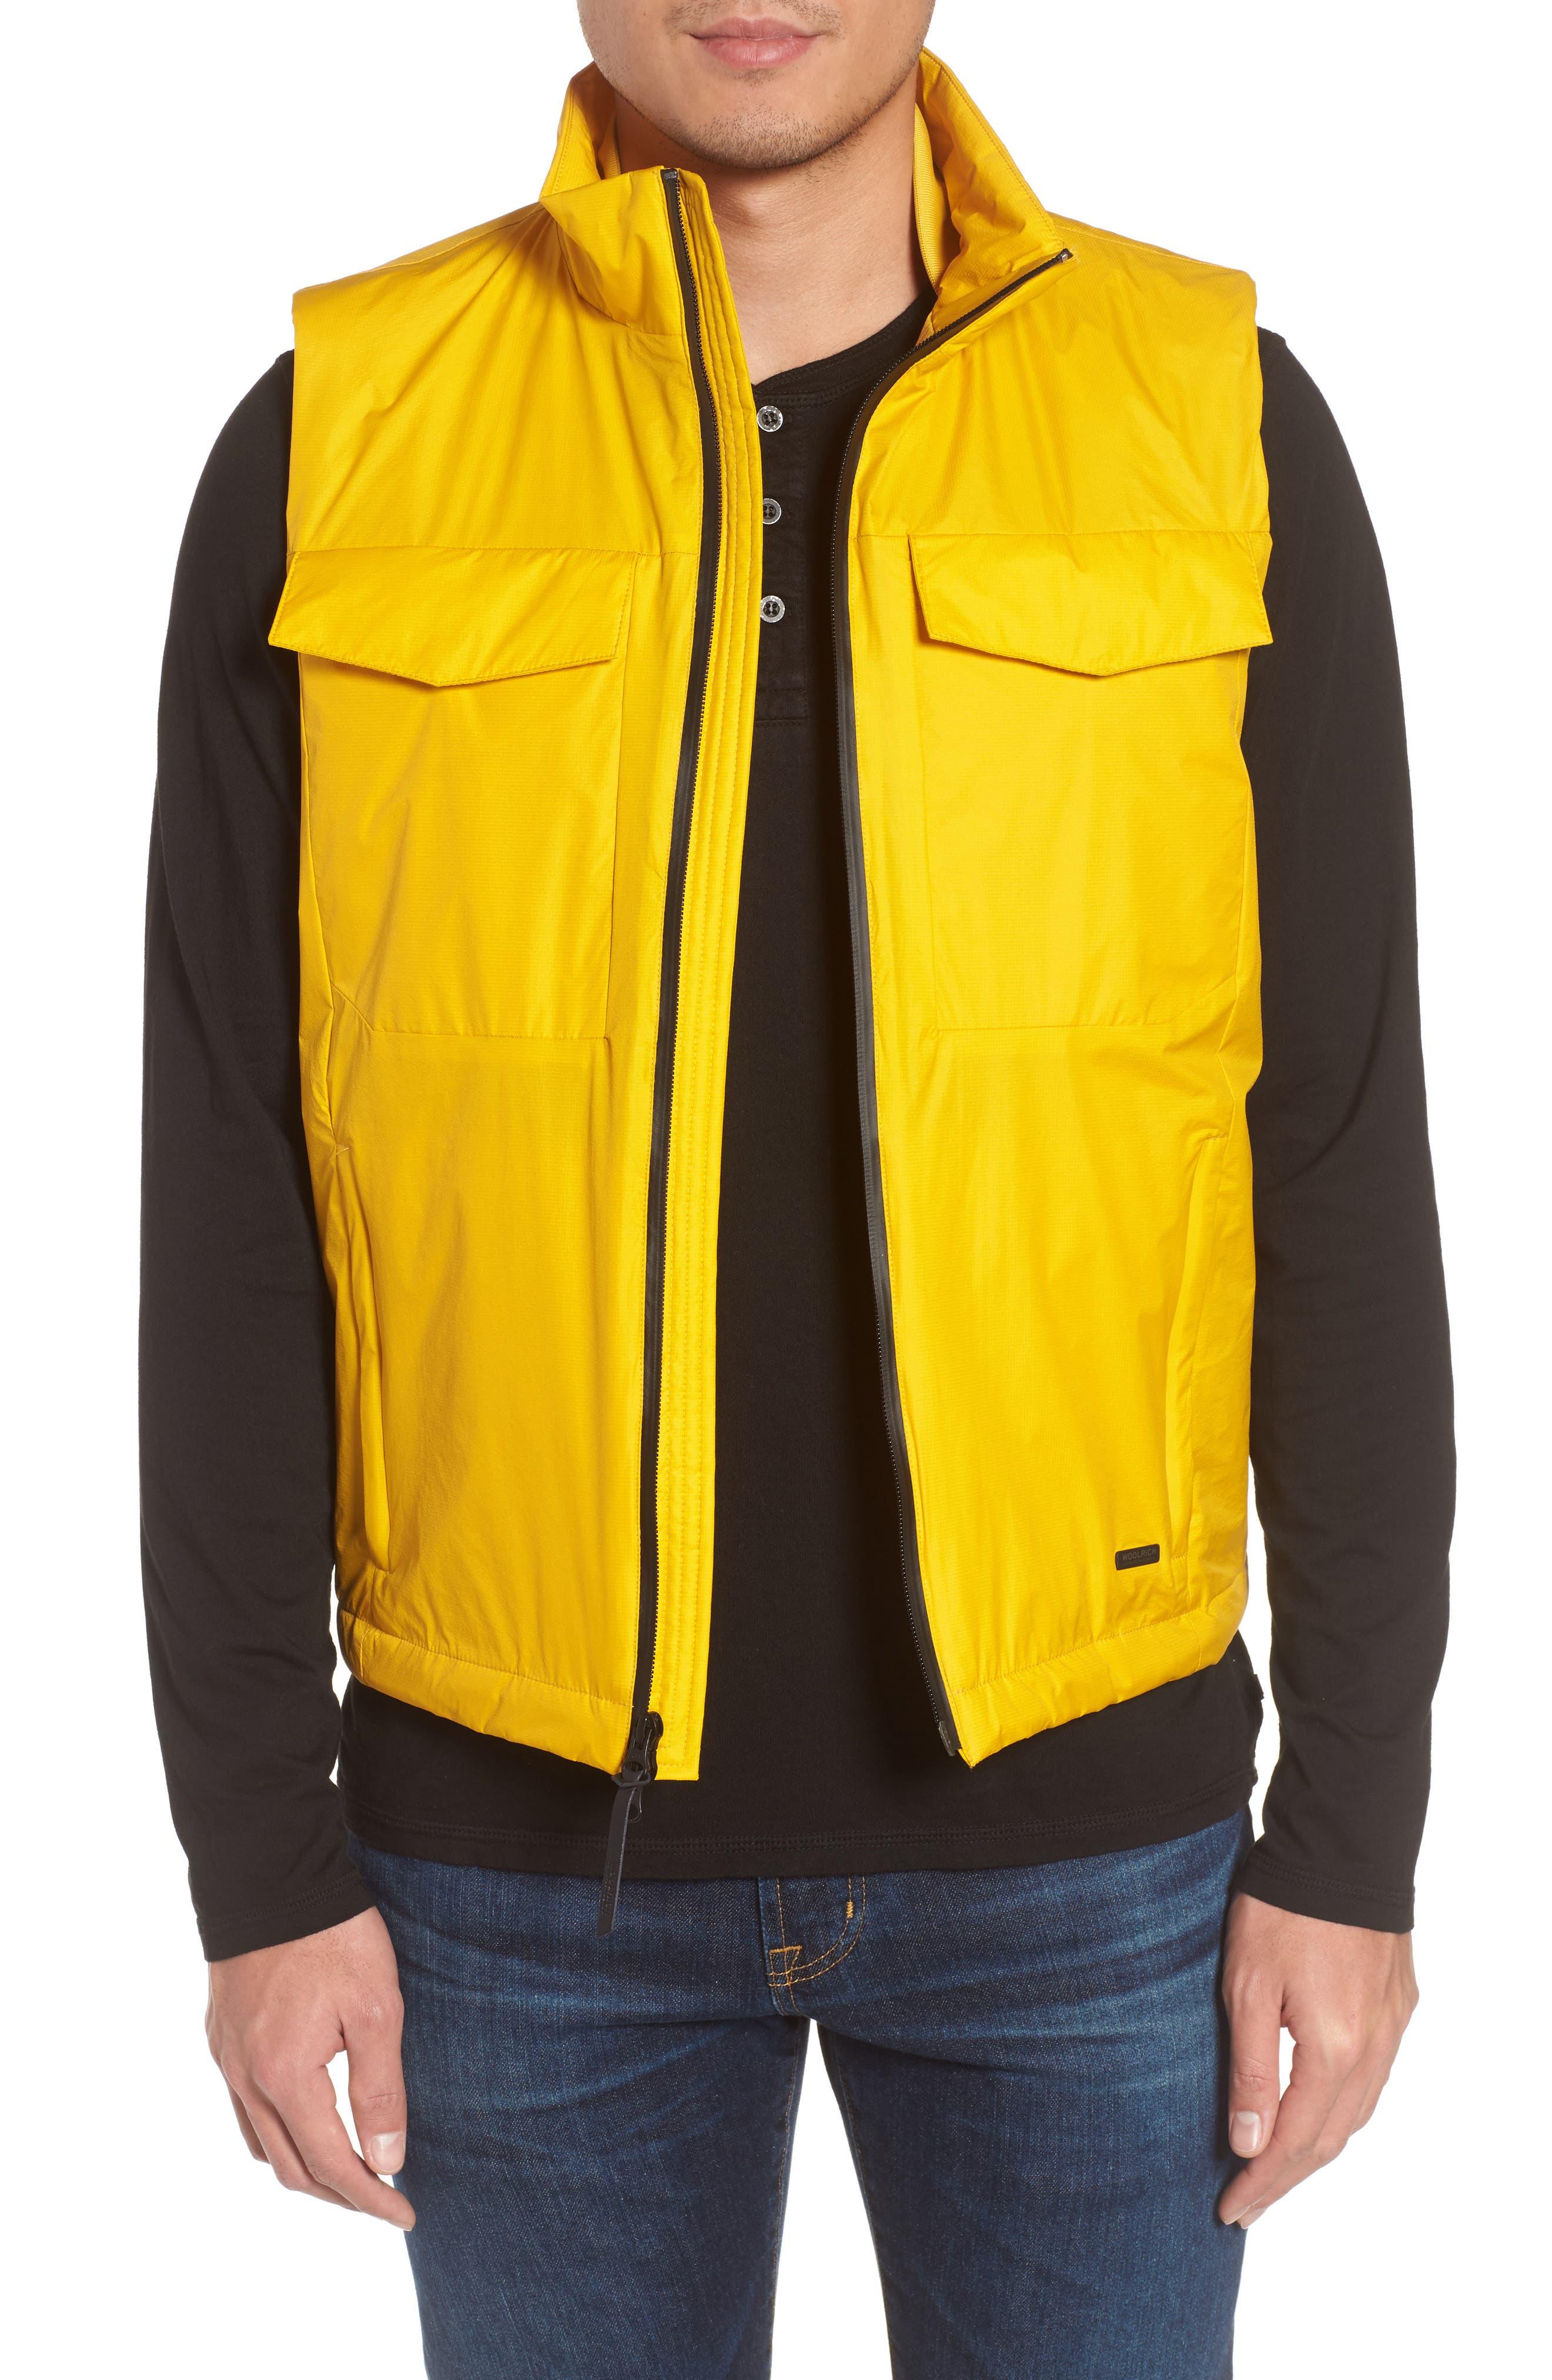 & Bros. Bering Vest,                         Main,                         color, Golden Spice